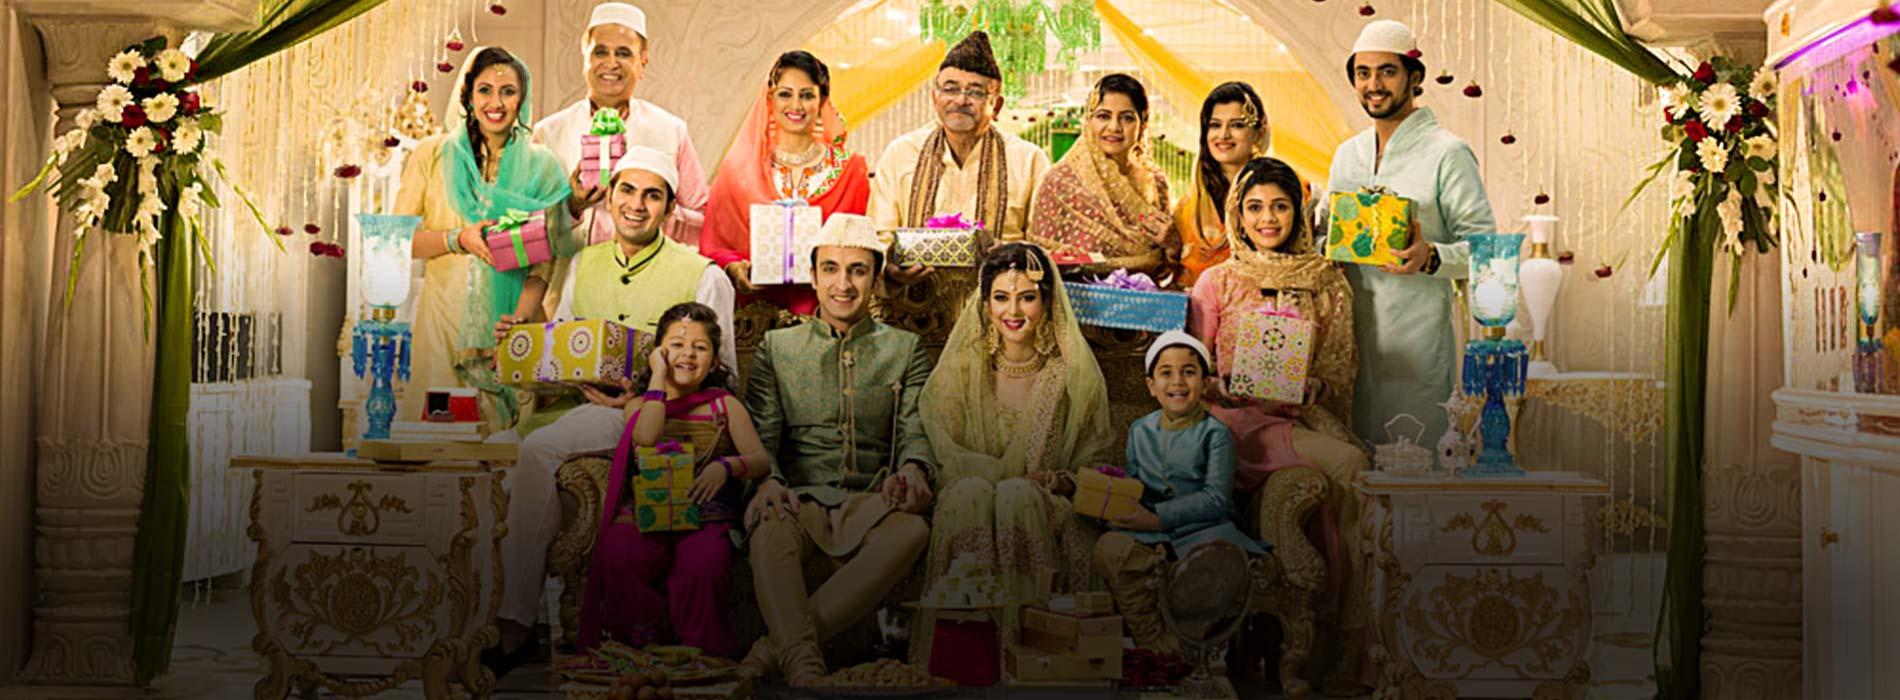 Muslim Sangam - Matrimonial Site for Muslim Community, Matrimony